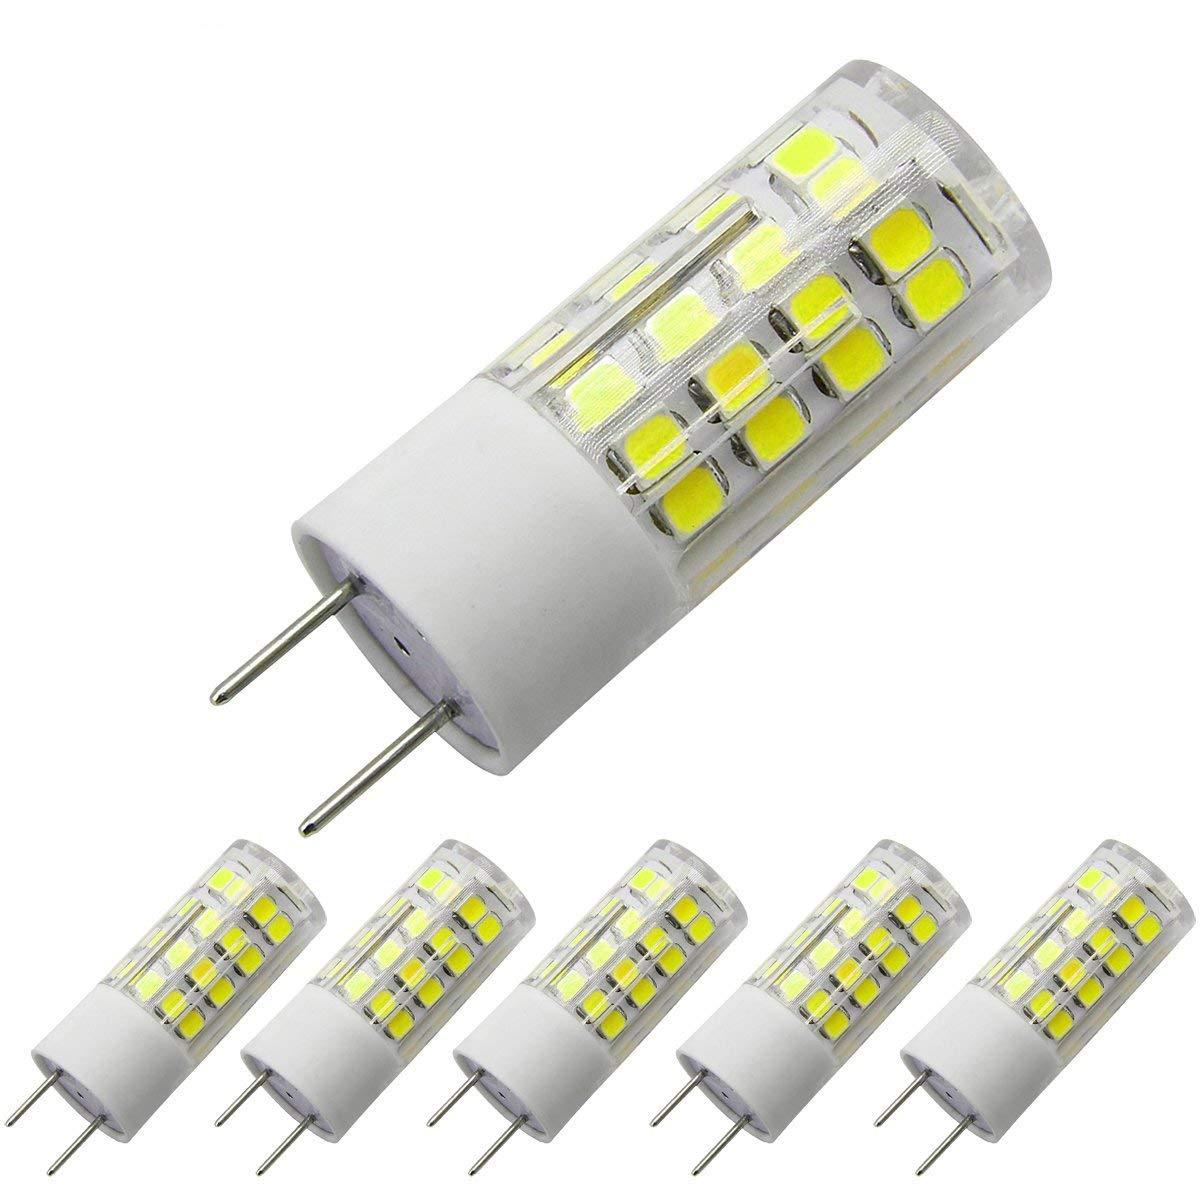 G8 Led Bulb 120V, 6000K Daylight White T4 Gy8.6 Bi-pin